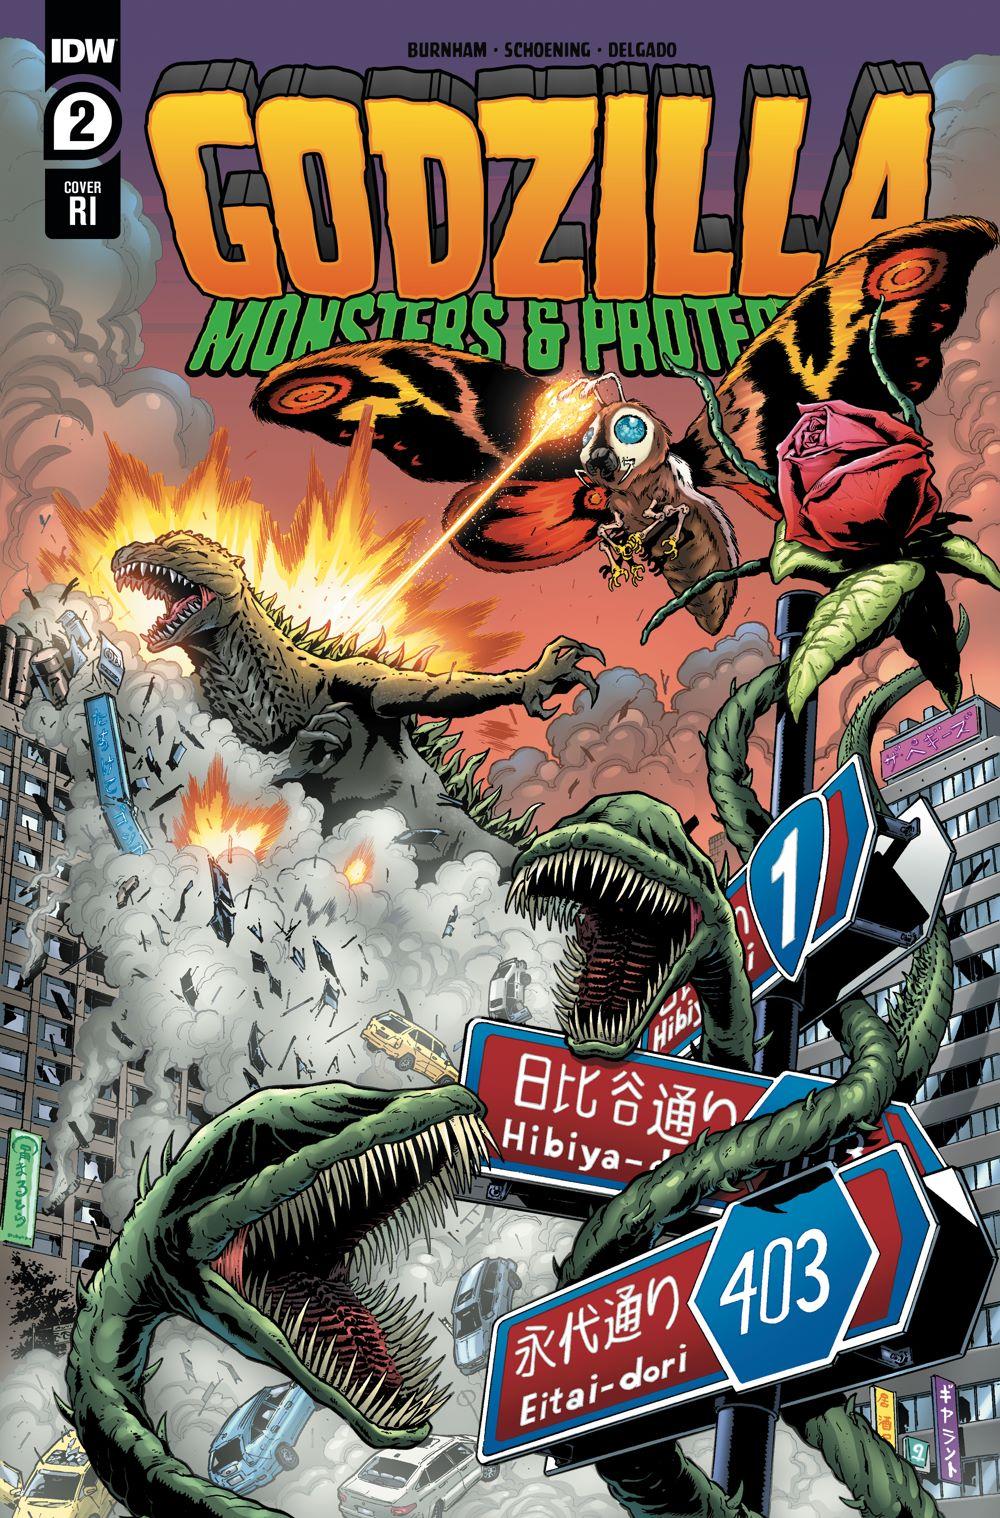 Godzilla_MP02-coverRI ComicList Previews: GODZILLA MONSTERS AND PROTECTORS #2 (OF 5)